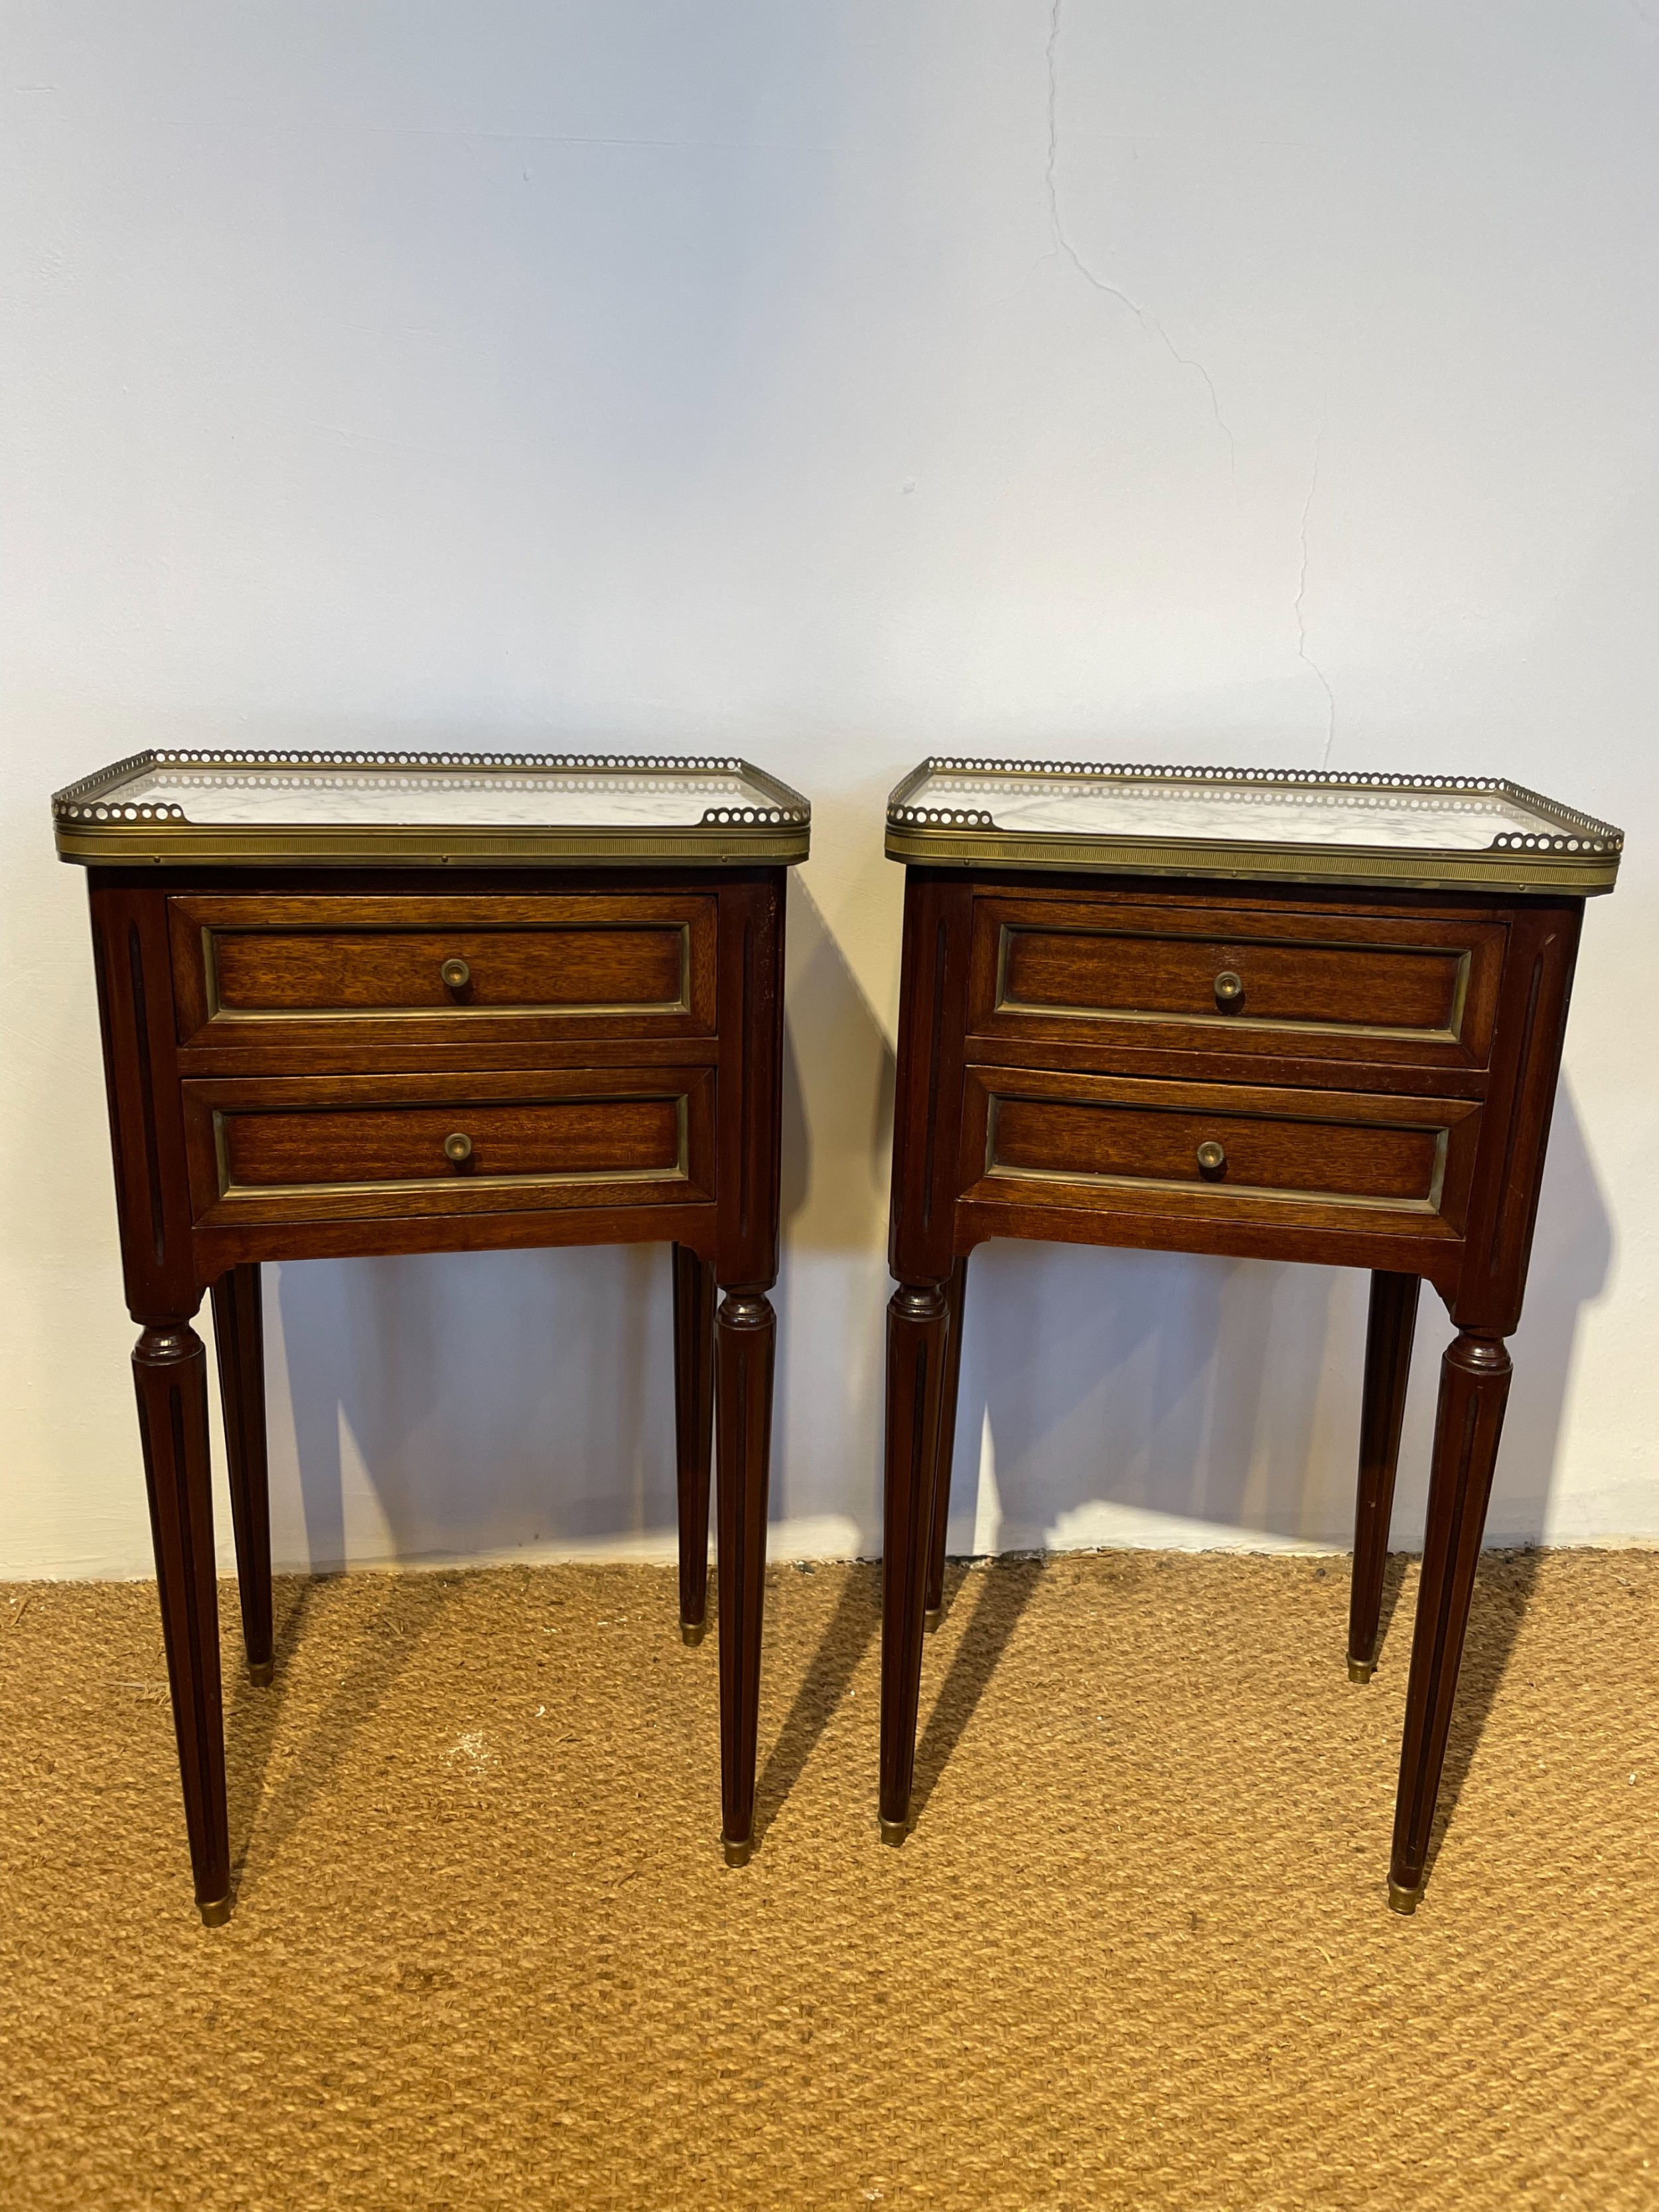 neat pair of mahogany bedside cabinets